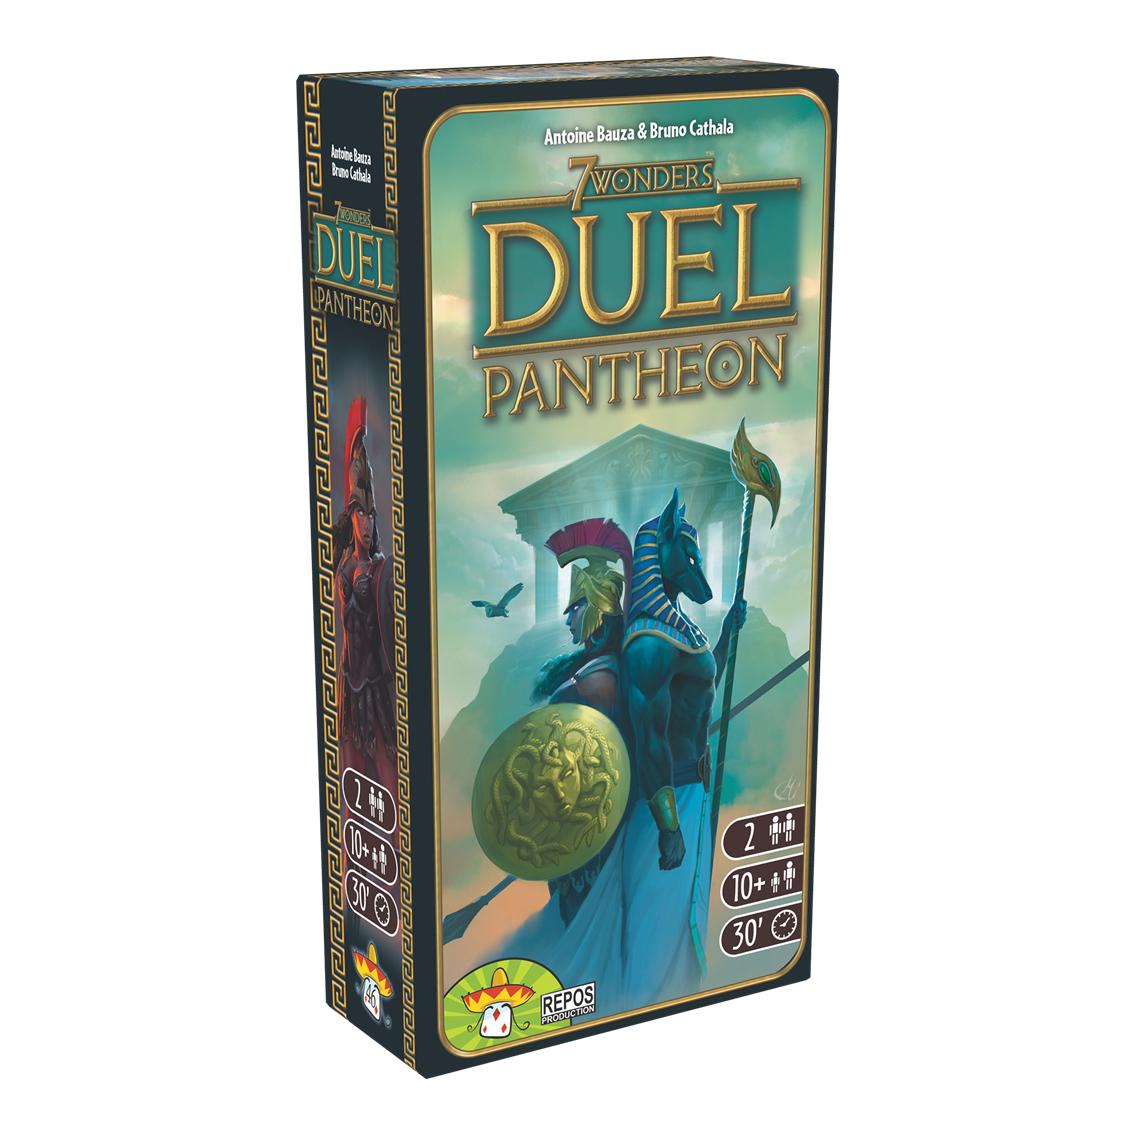 7 Wonders Duel, Pantheon (extension)